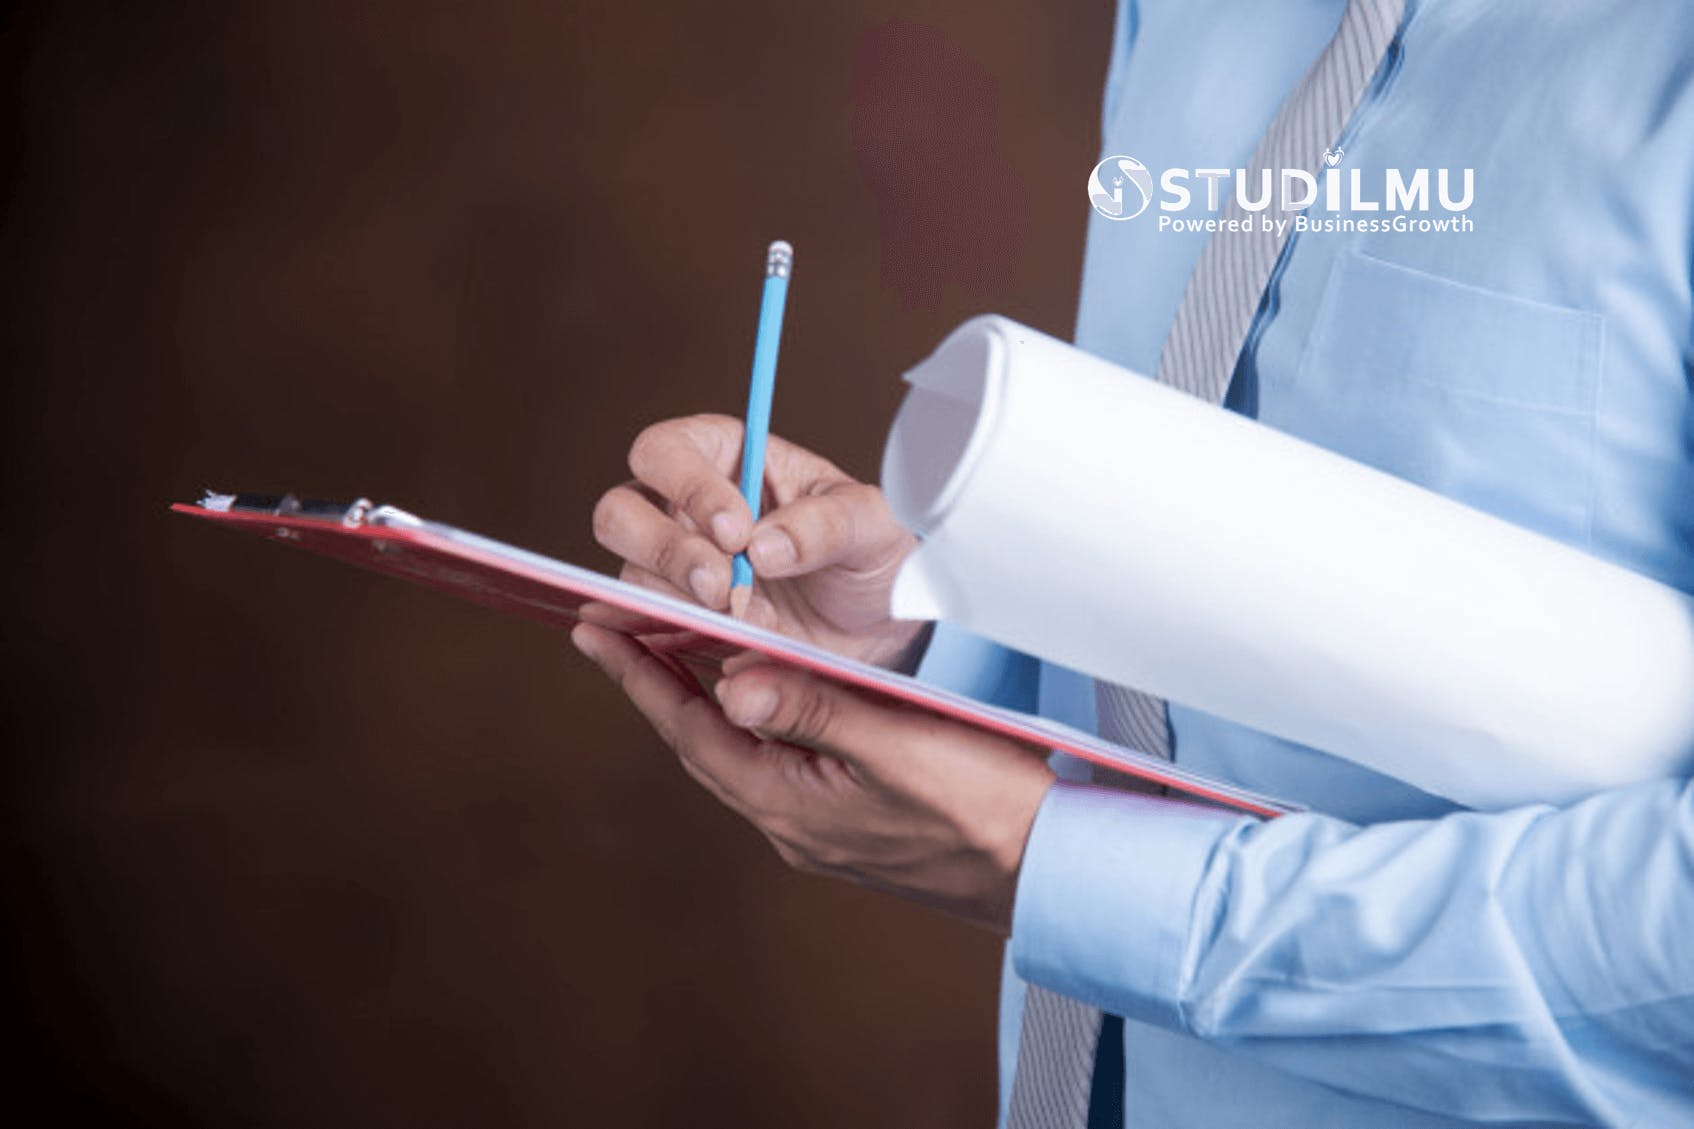 STUDILMU Career Advice - 5 Faktor yang Menciptakan Etos Kerja yang Kuat